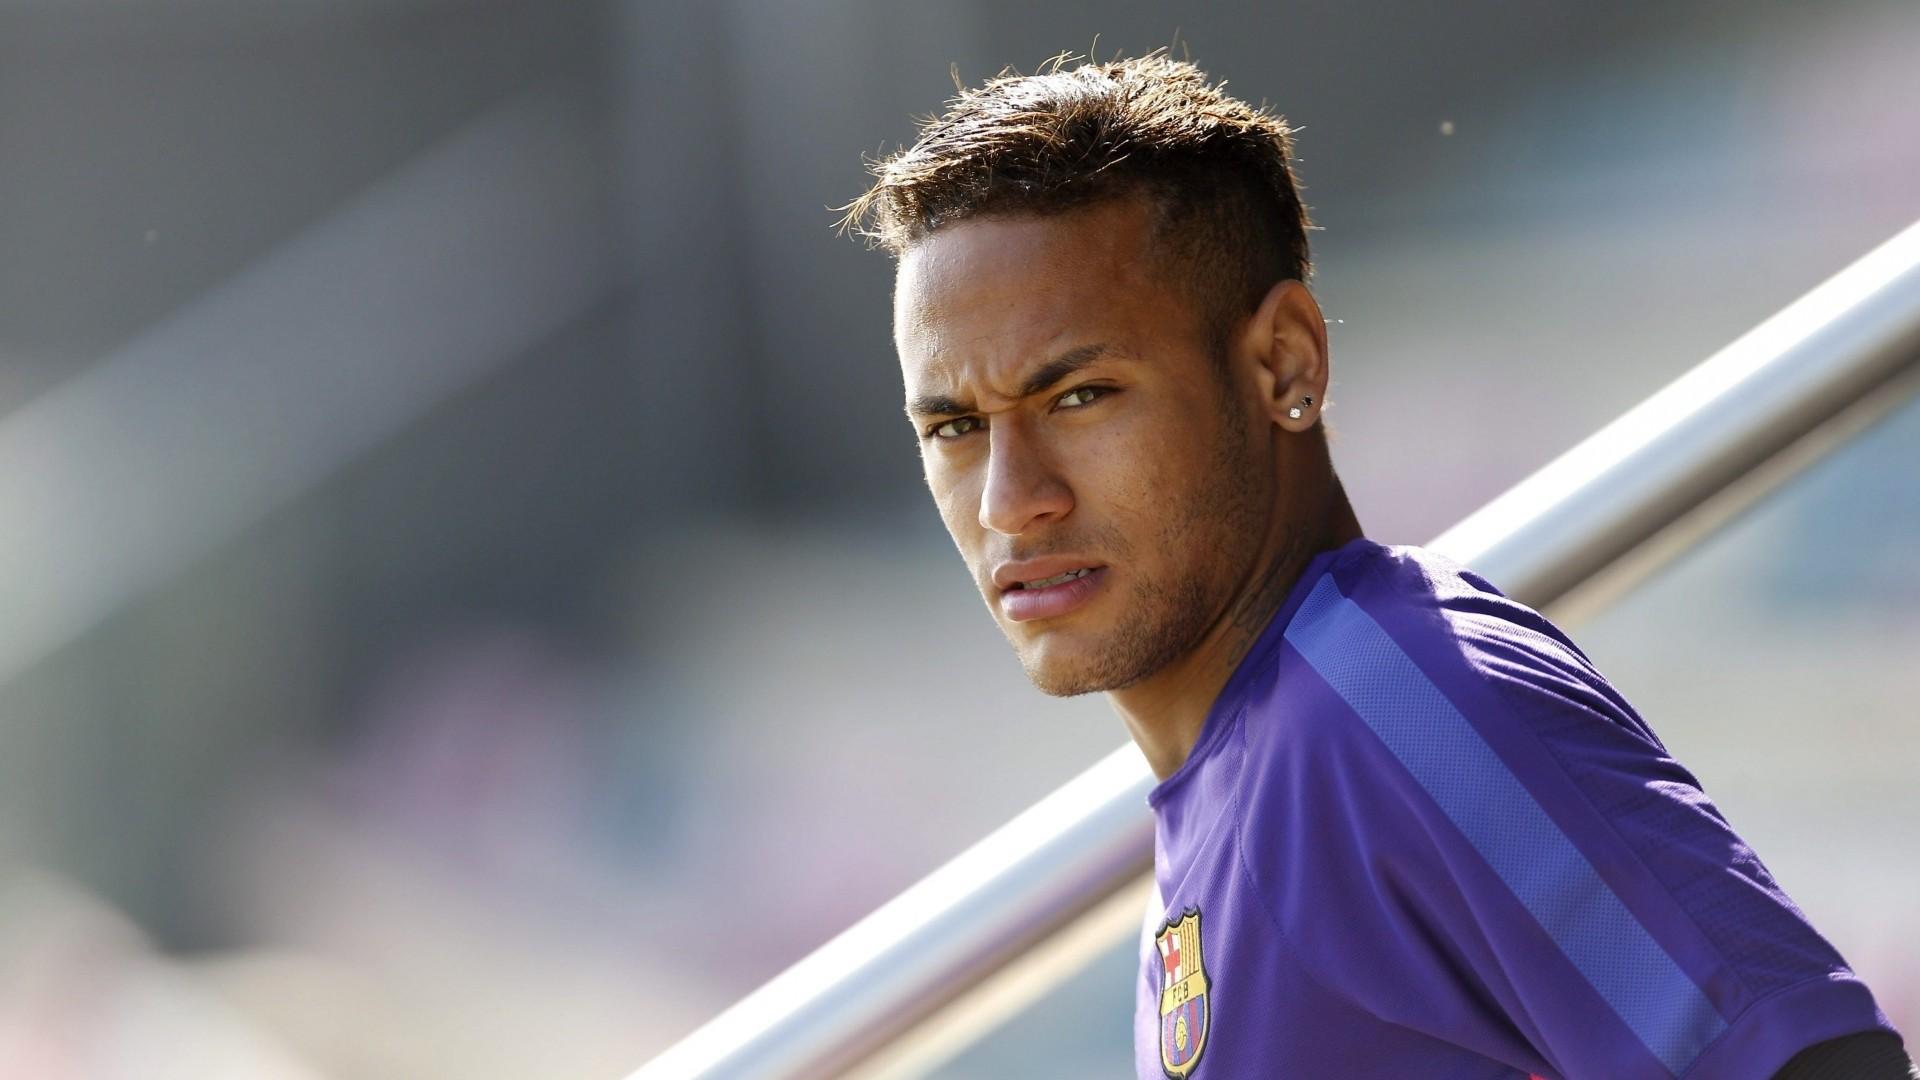 Neymar Wallpaper image hd